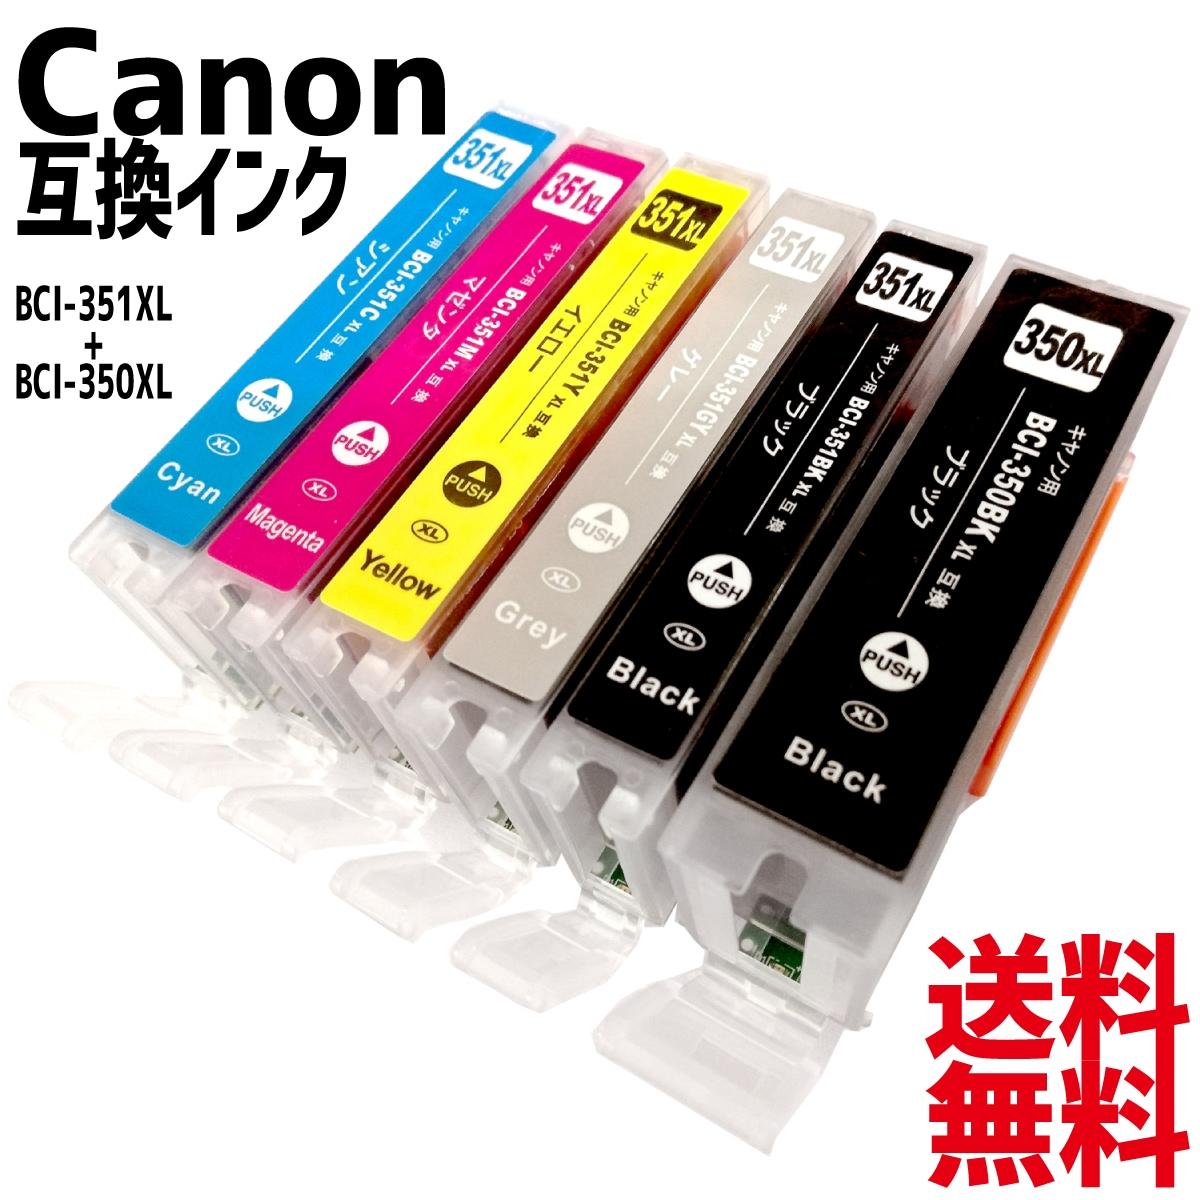 Canon キャノン 互換インクカートリッジ BCI-351XL+BCI-350XL 6色マルチパック 大容量 残量表示機能付 Purple7